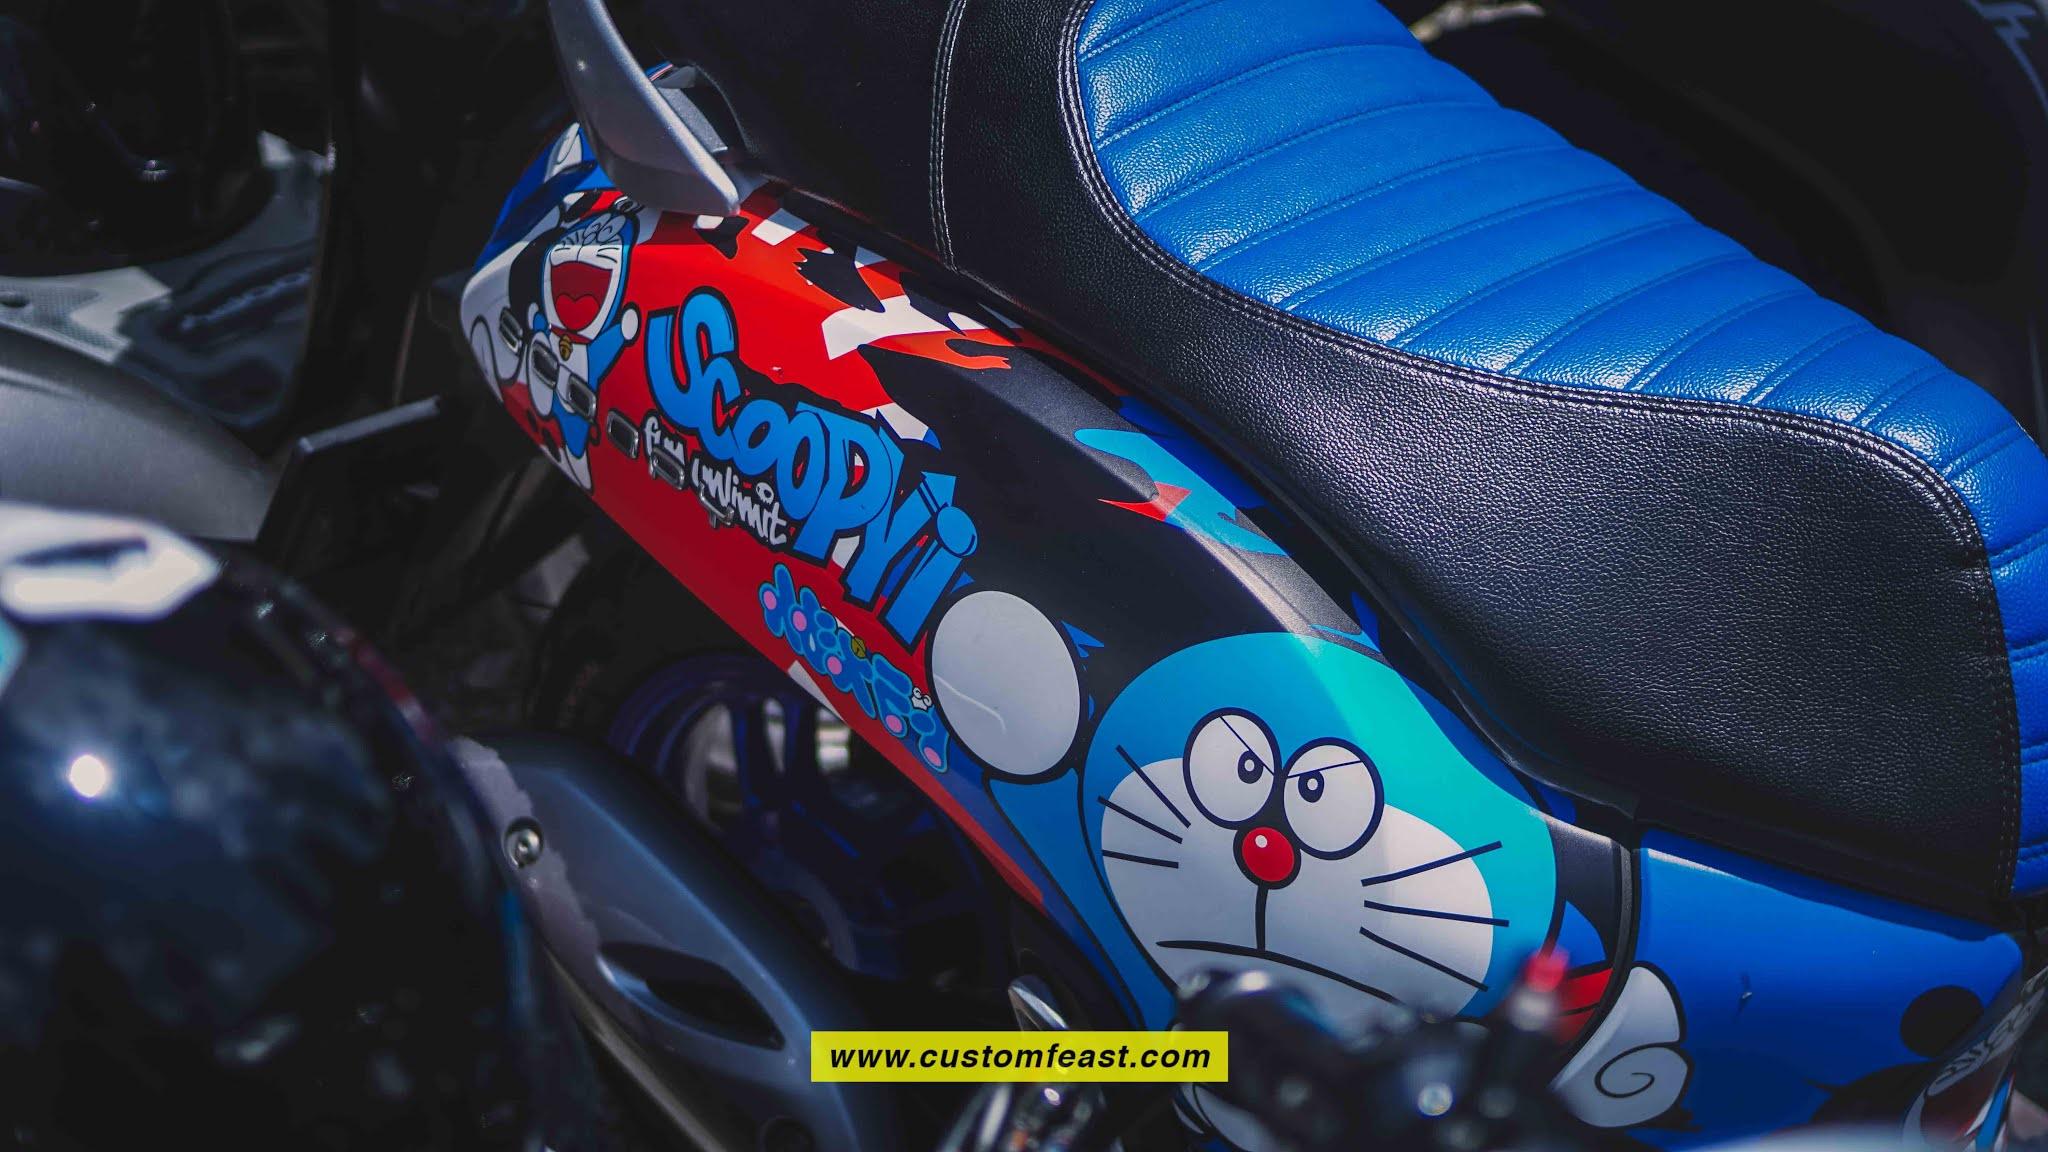 Modifikasi Scoopy 2020 - Sticker Scoopy Doraemon